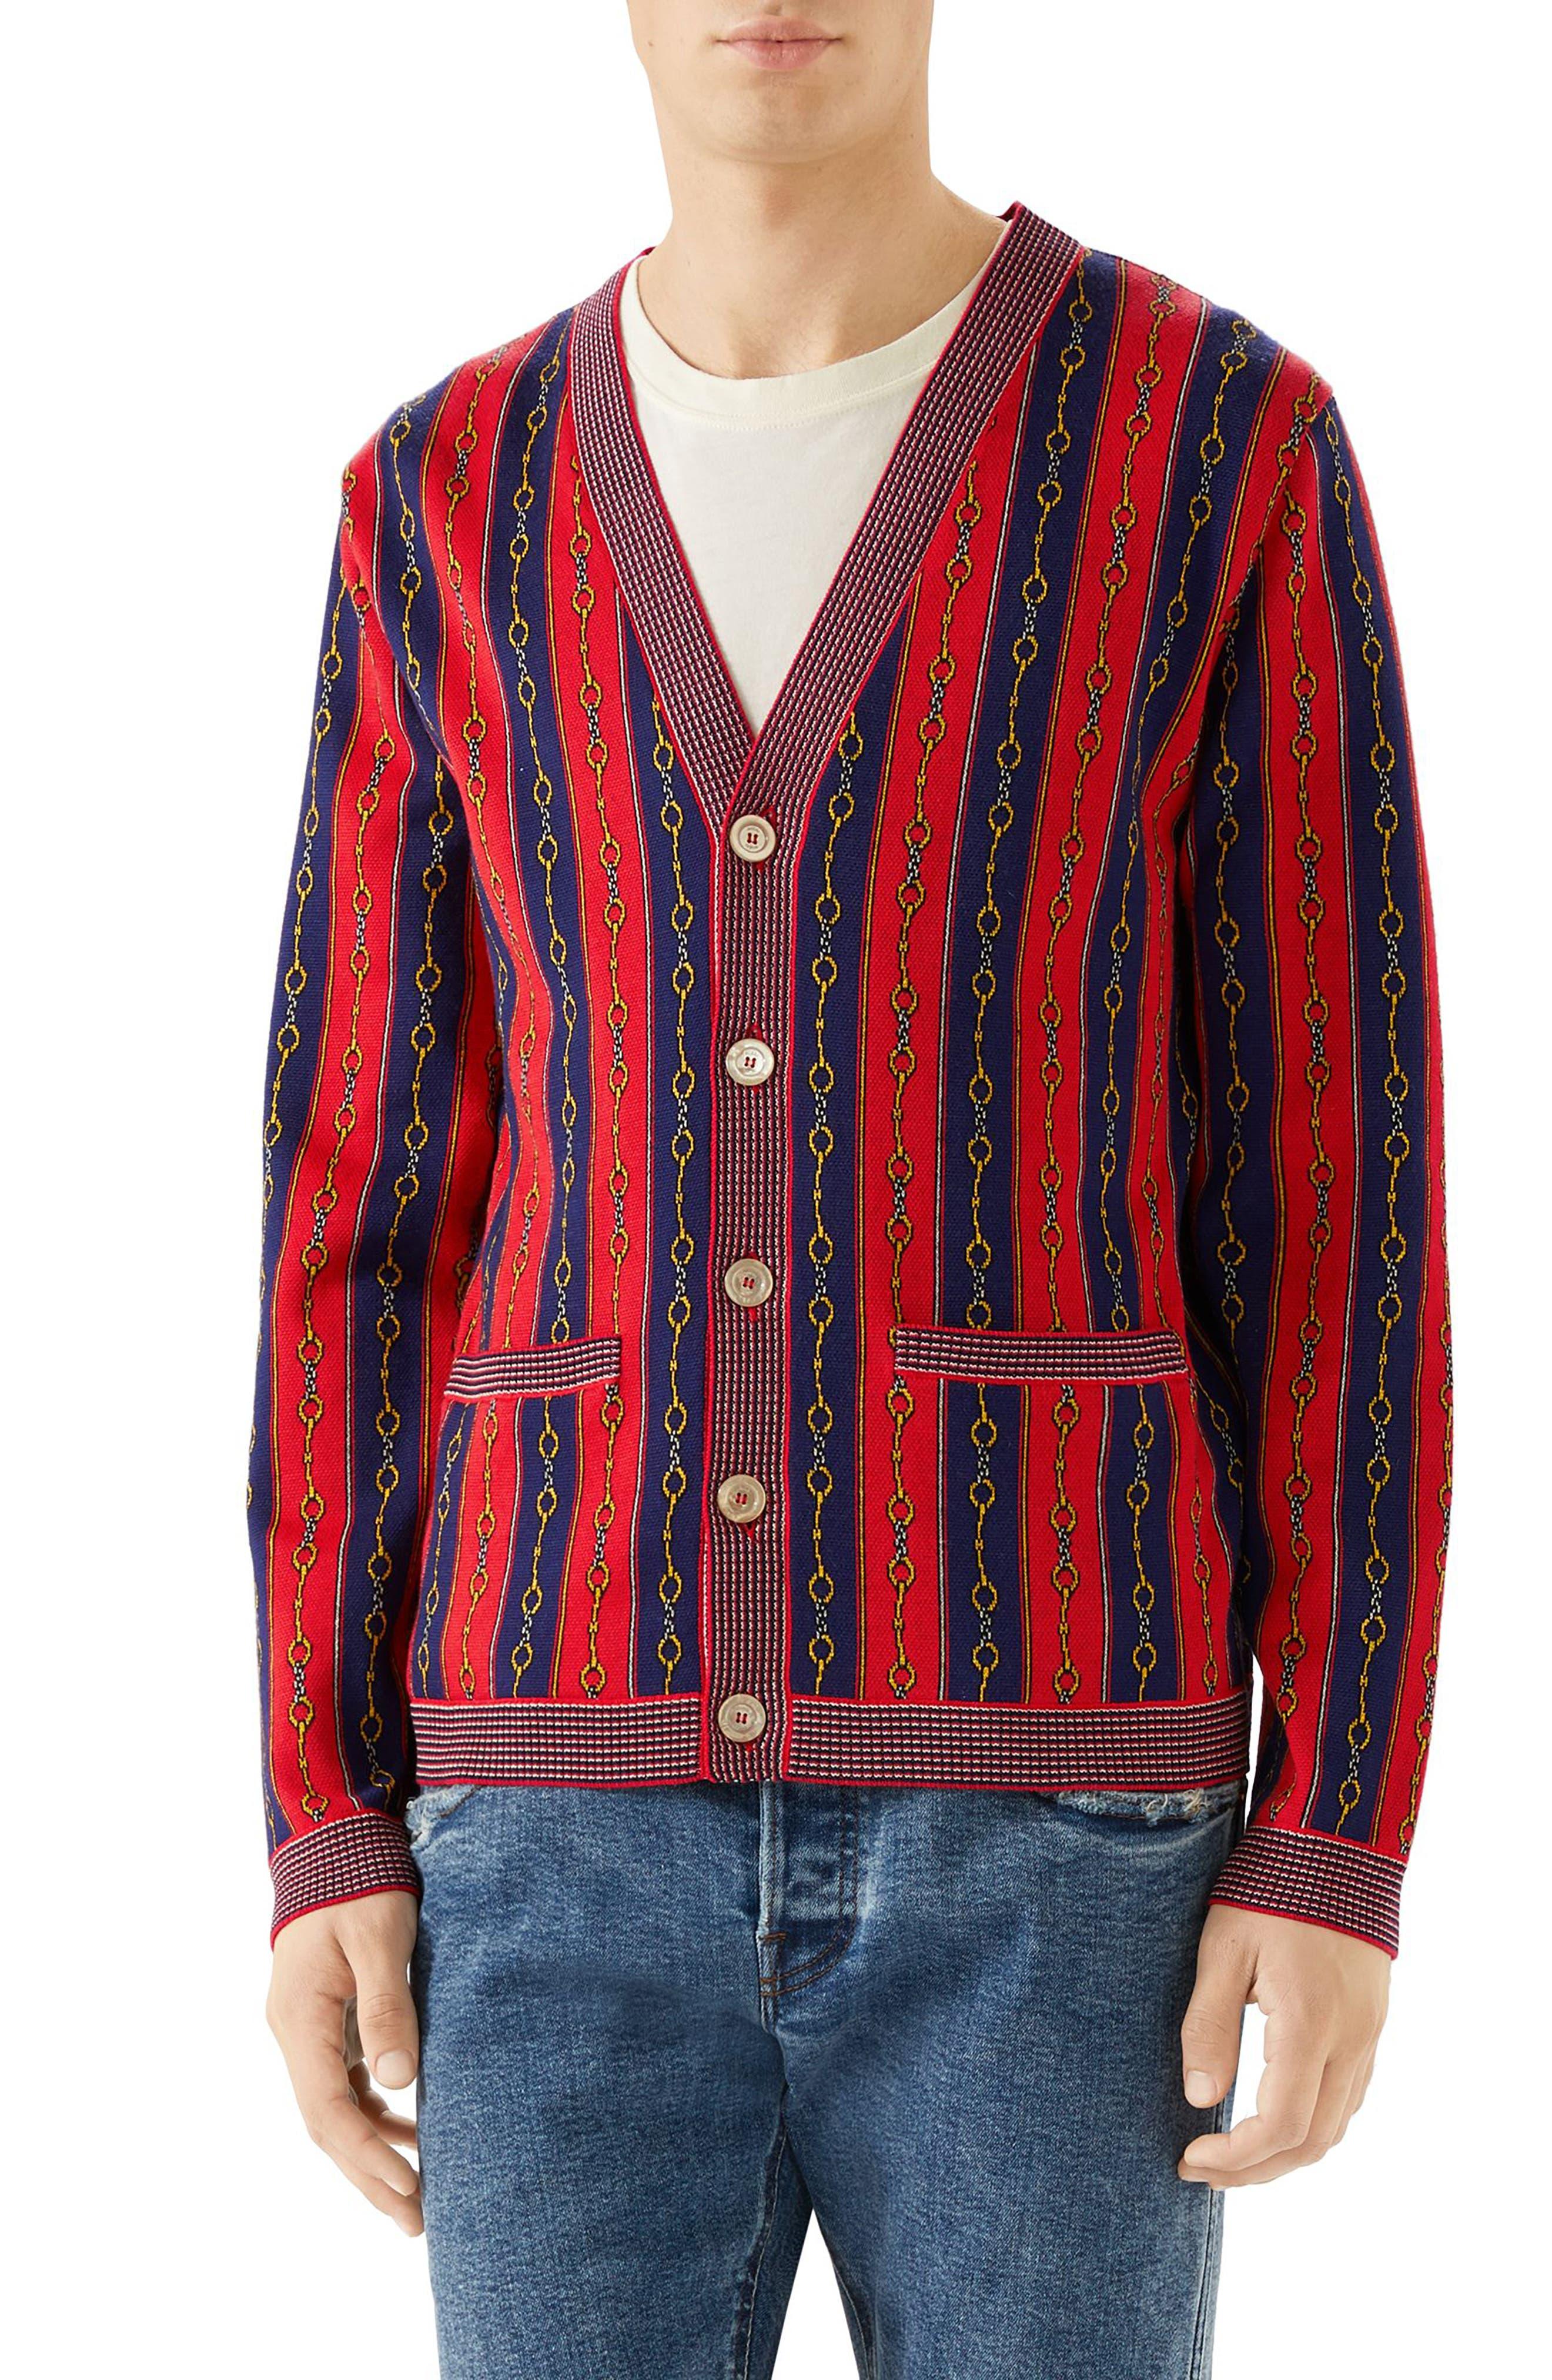 Gucci Horsebit Stripe Cardigan, Red